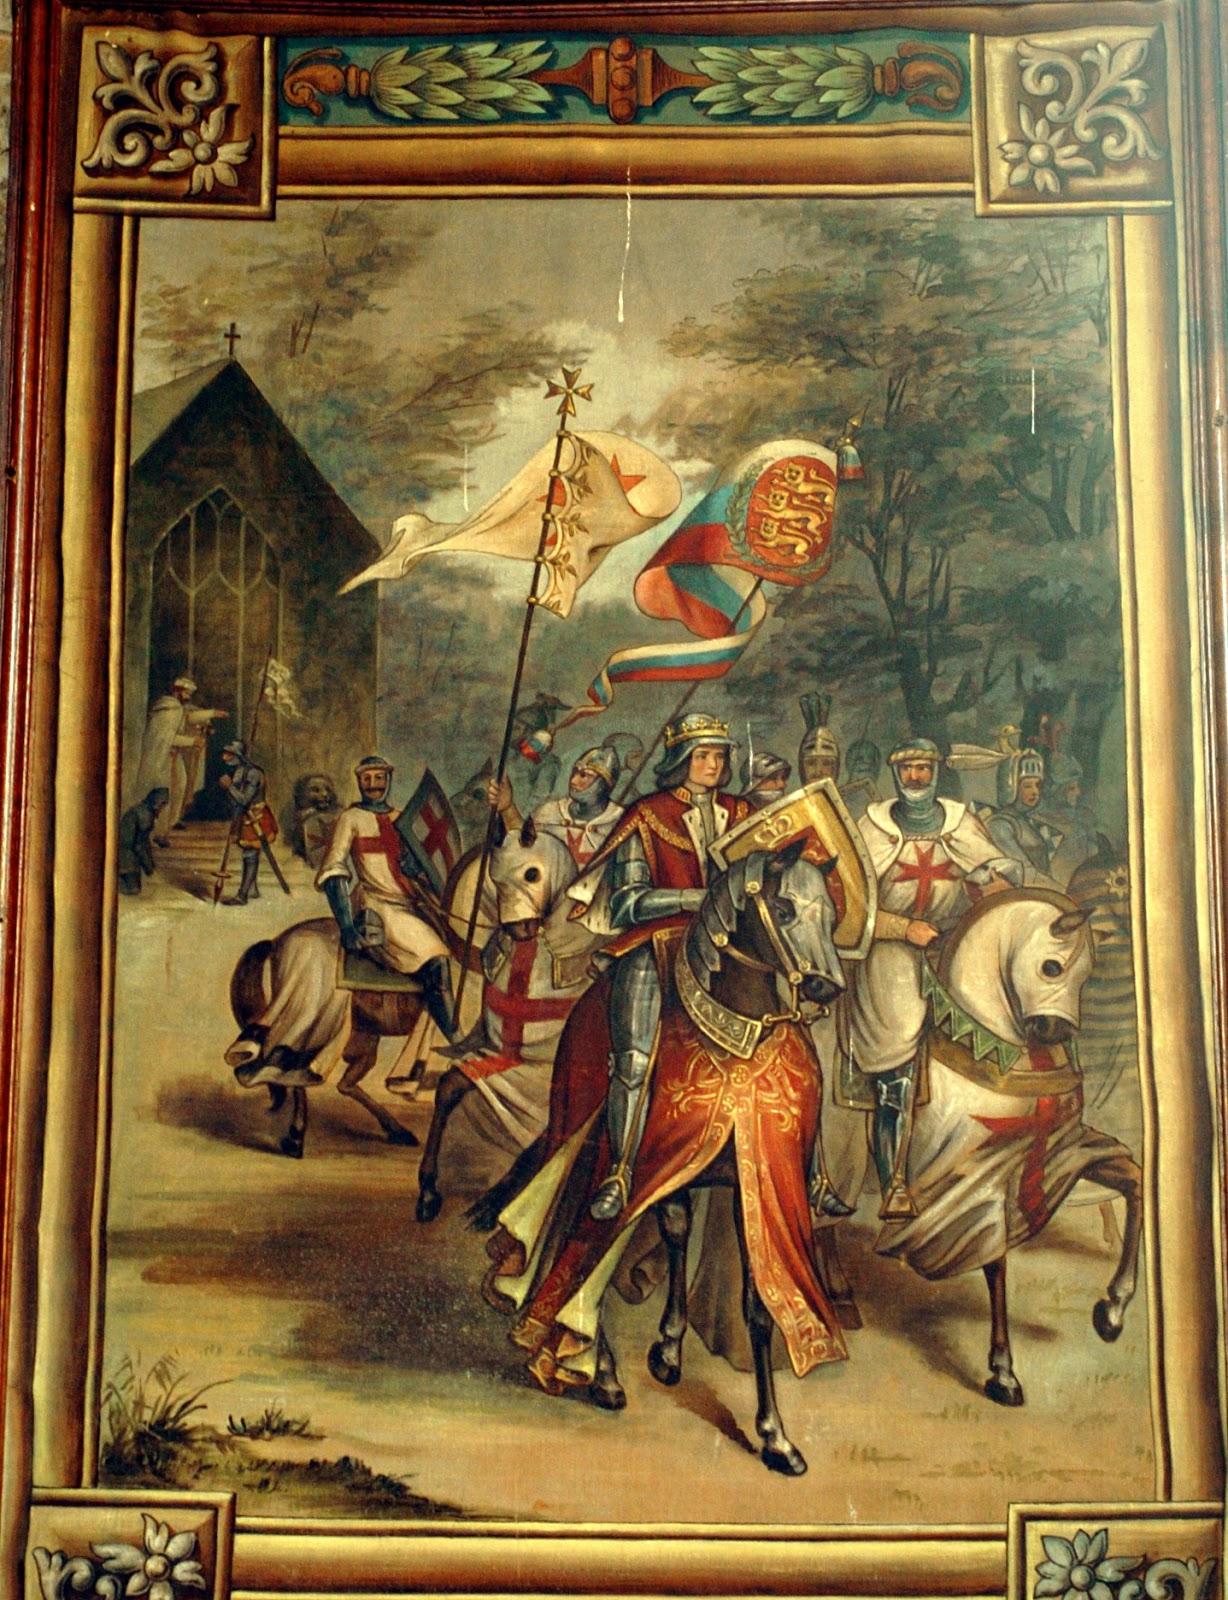 http://2.bp.blogspot.com/-sPwoOwJQQS0/UJvvakso1II/AAAAAAAAAV8/PhFFEM-U_Xc/s1600/Knights+Templar+Painting+Rothley+Chapel.jpg